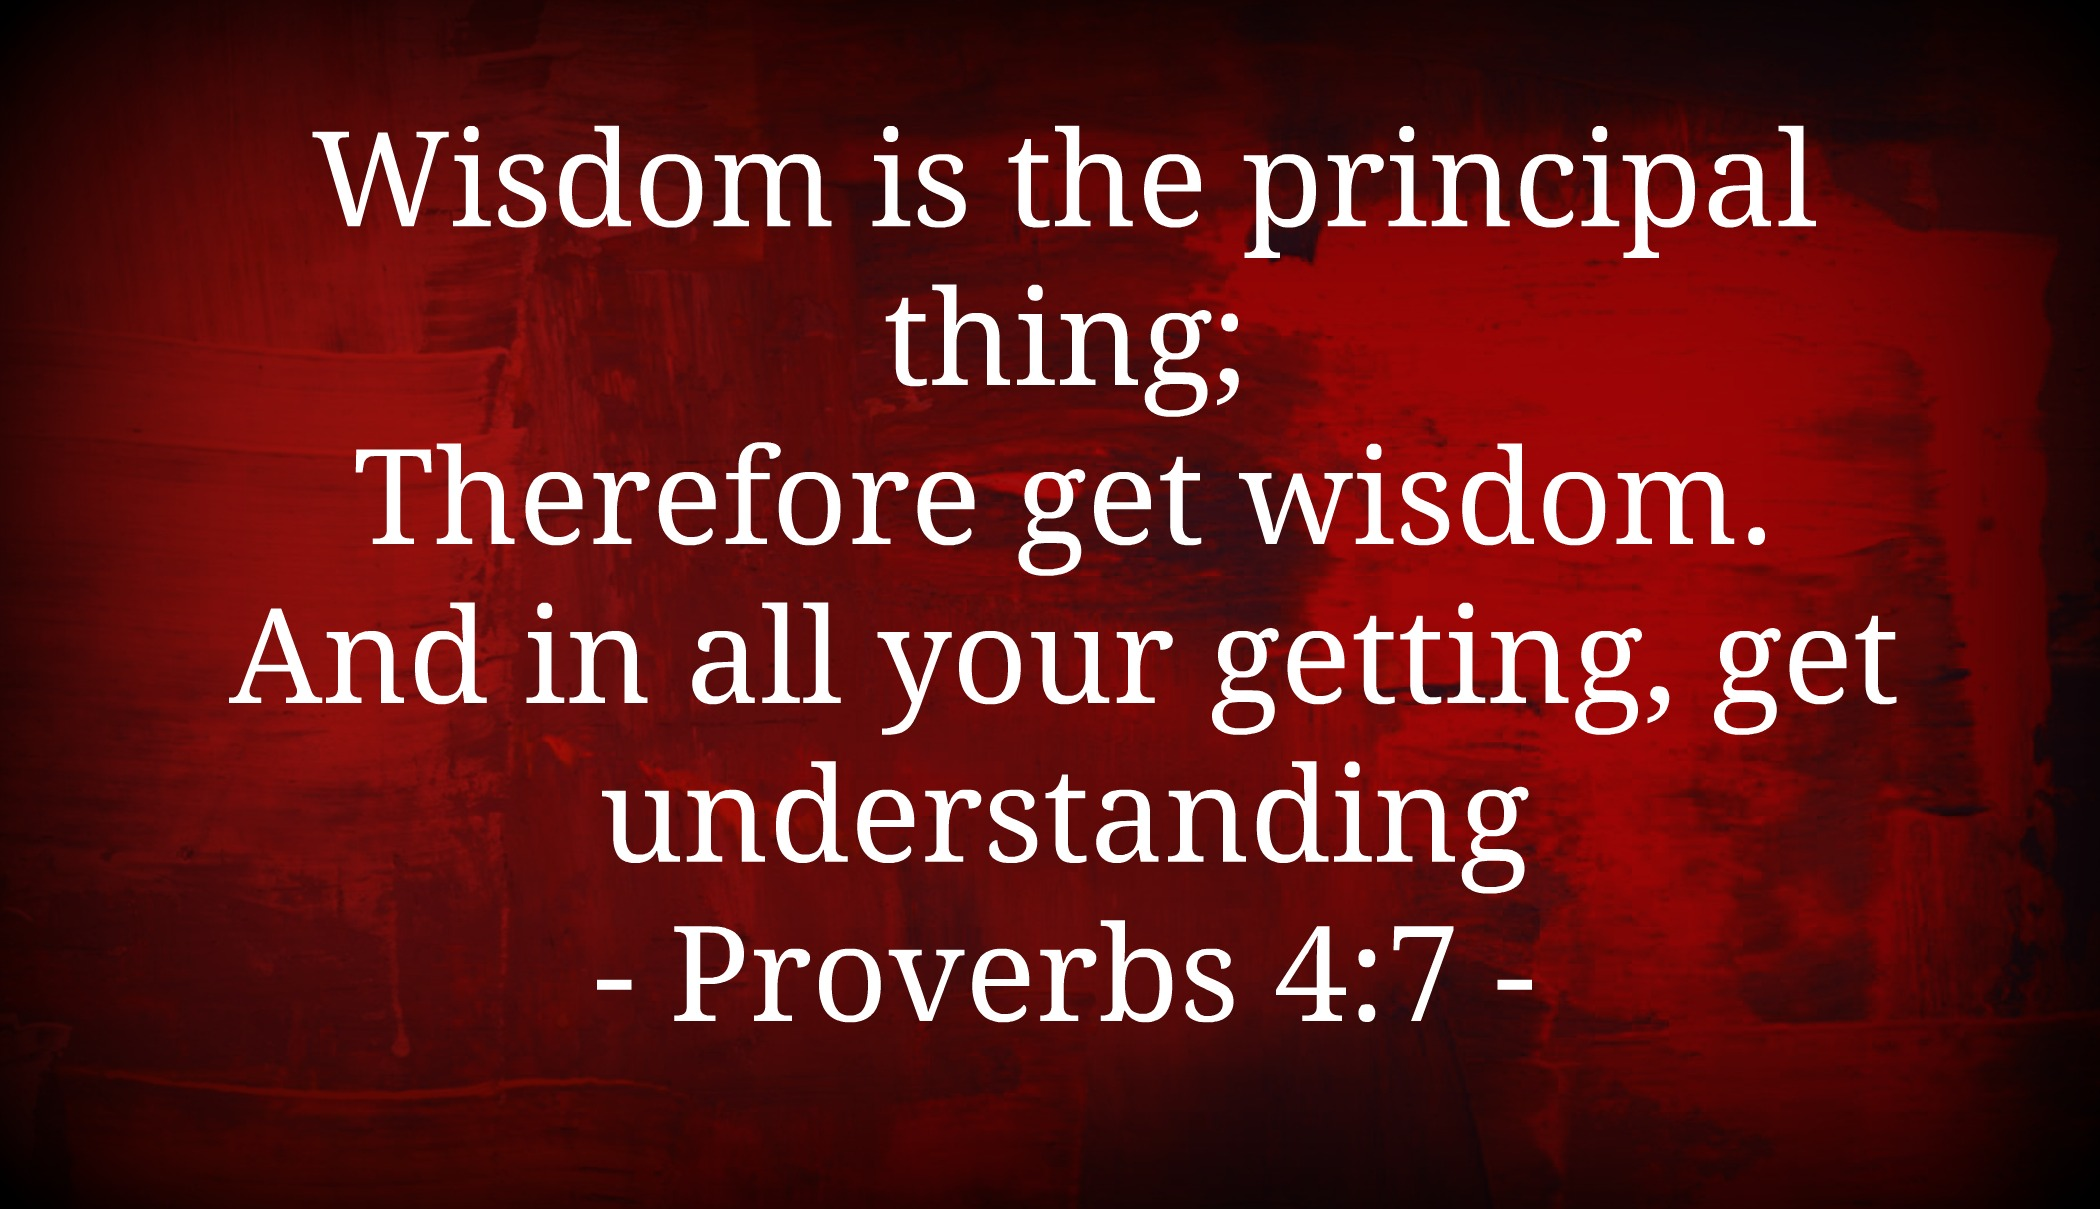 Wisdom.jpg (2100×1209)